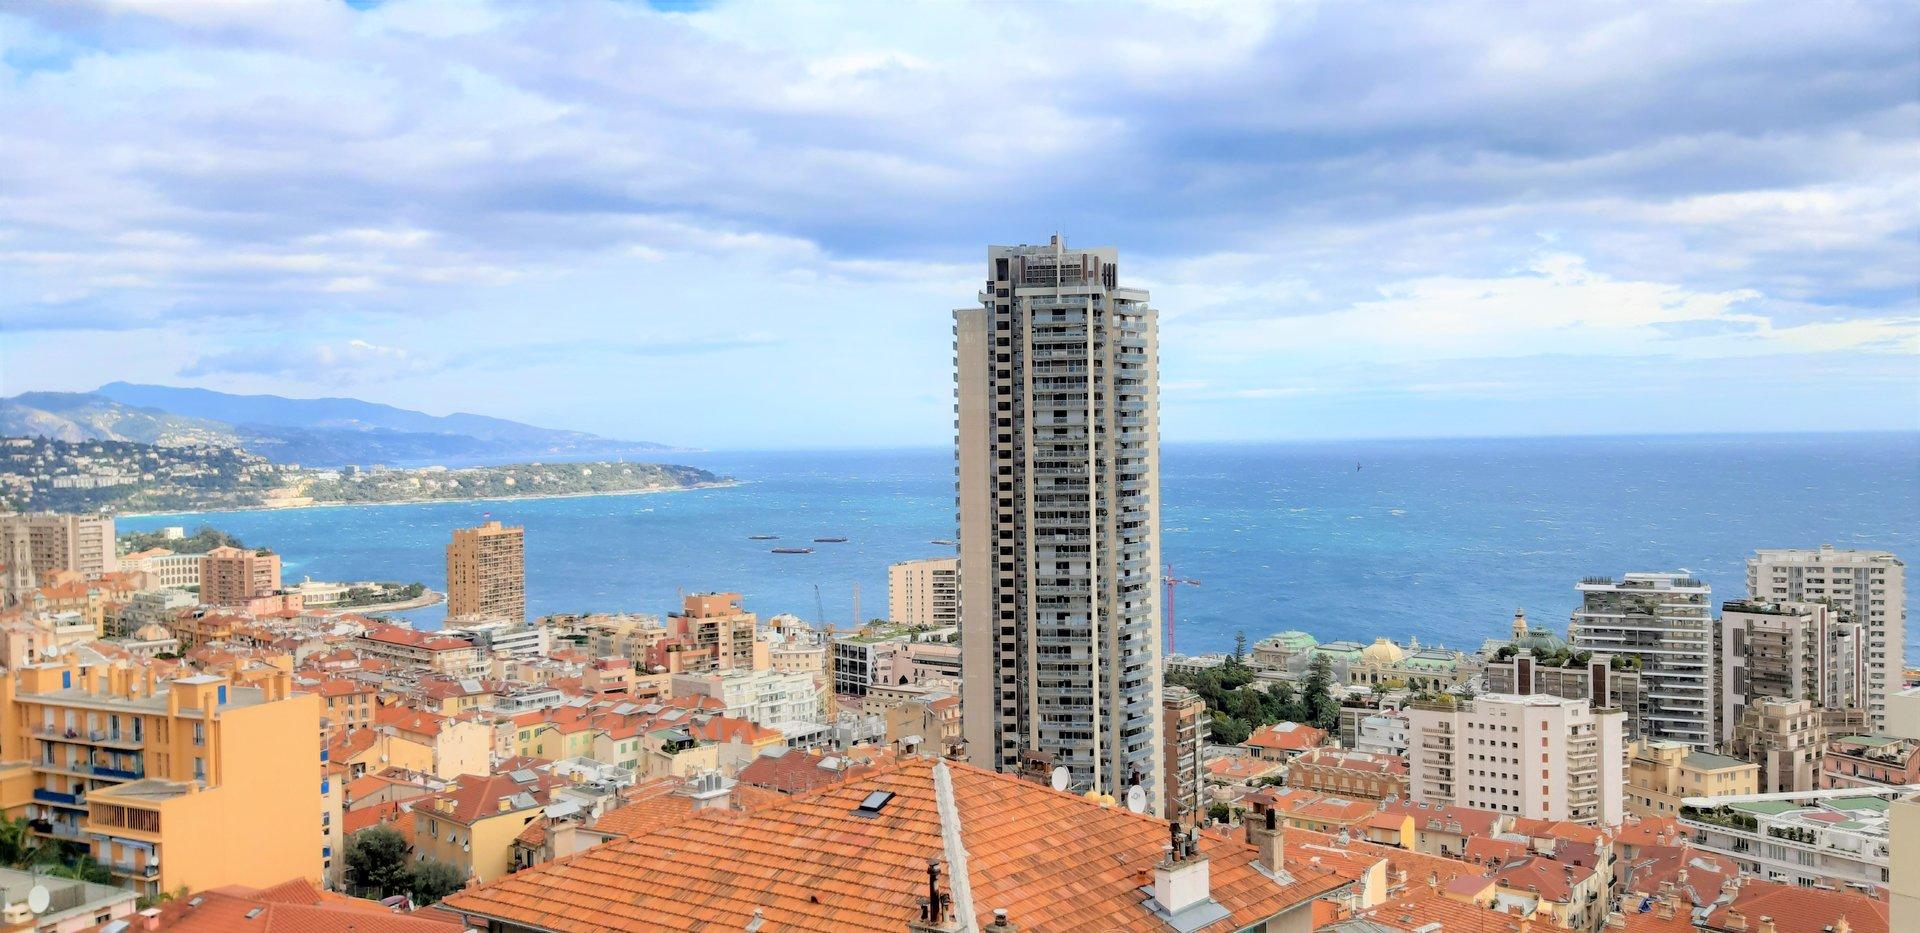 Beausoleil. Penthouse with sea views, walking distance to Monaco